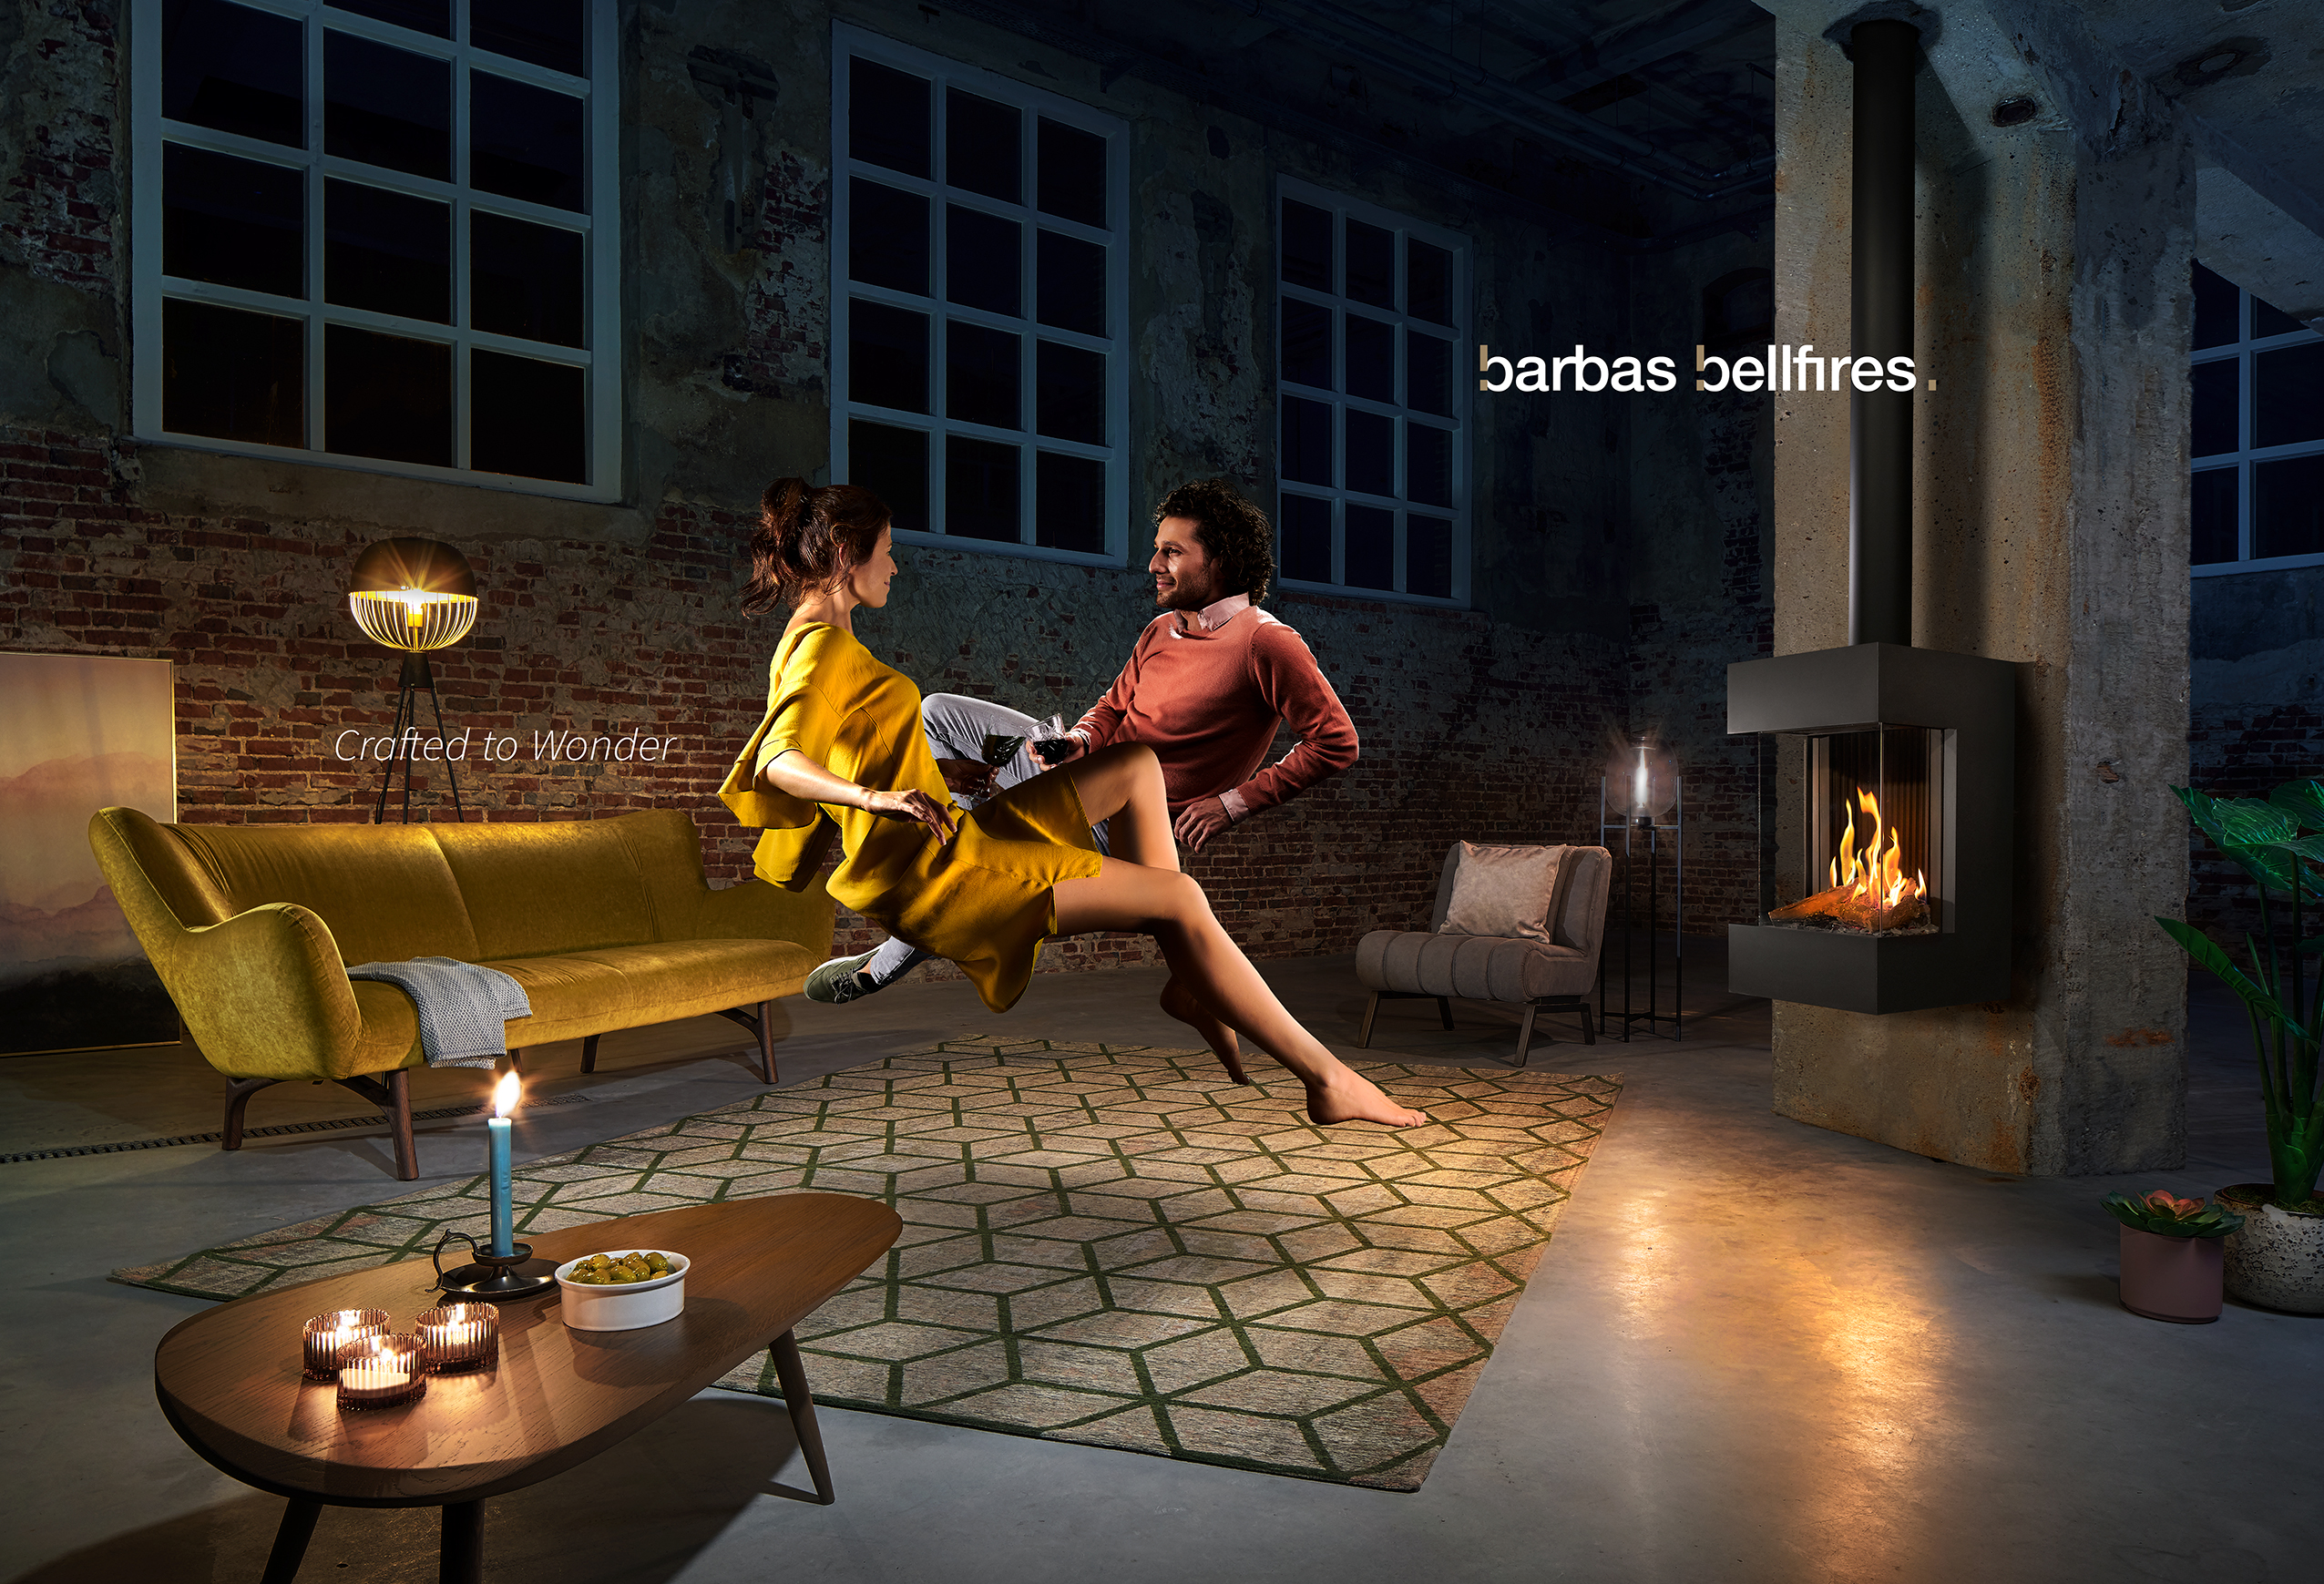 Barbas_Bellfires (c) Isabel Croon Couple